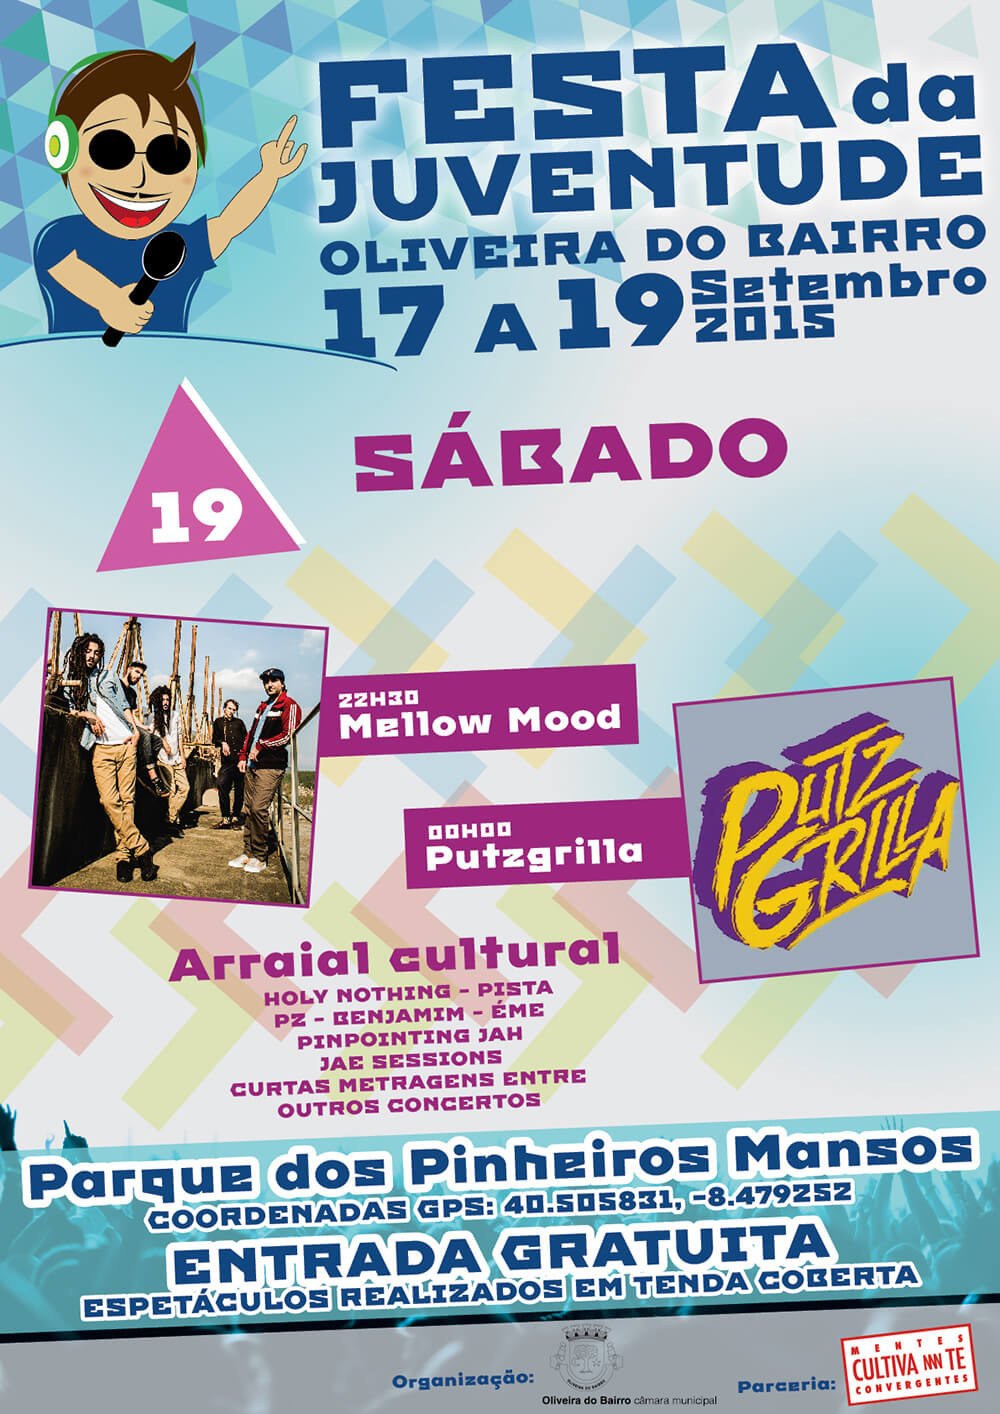 Festa da Juventude de Oliveira do Bairro - Poster for the 19th day | Way2Start - Design & Digital Agency